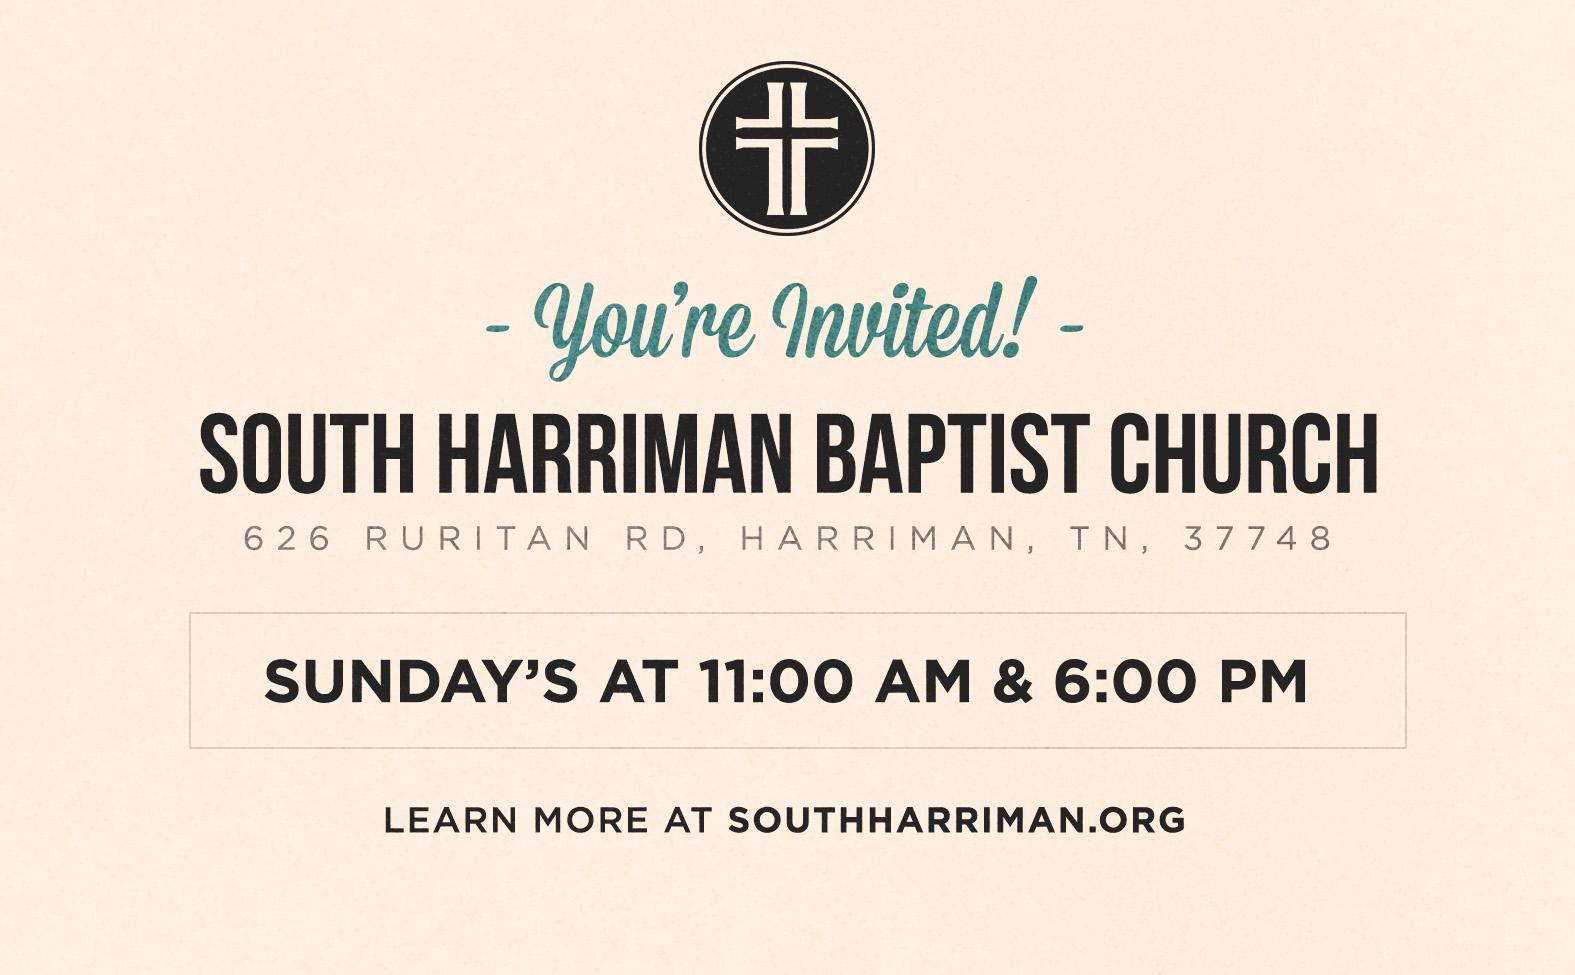 South_Harriman_Baptist_Church_Invite_Graphic.jpg